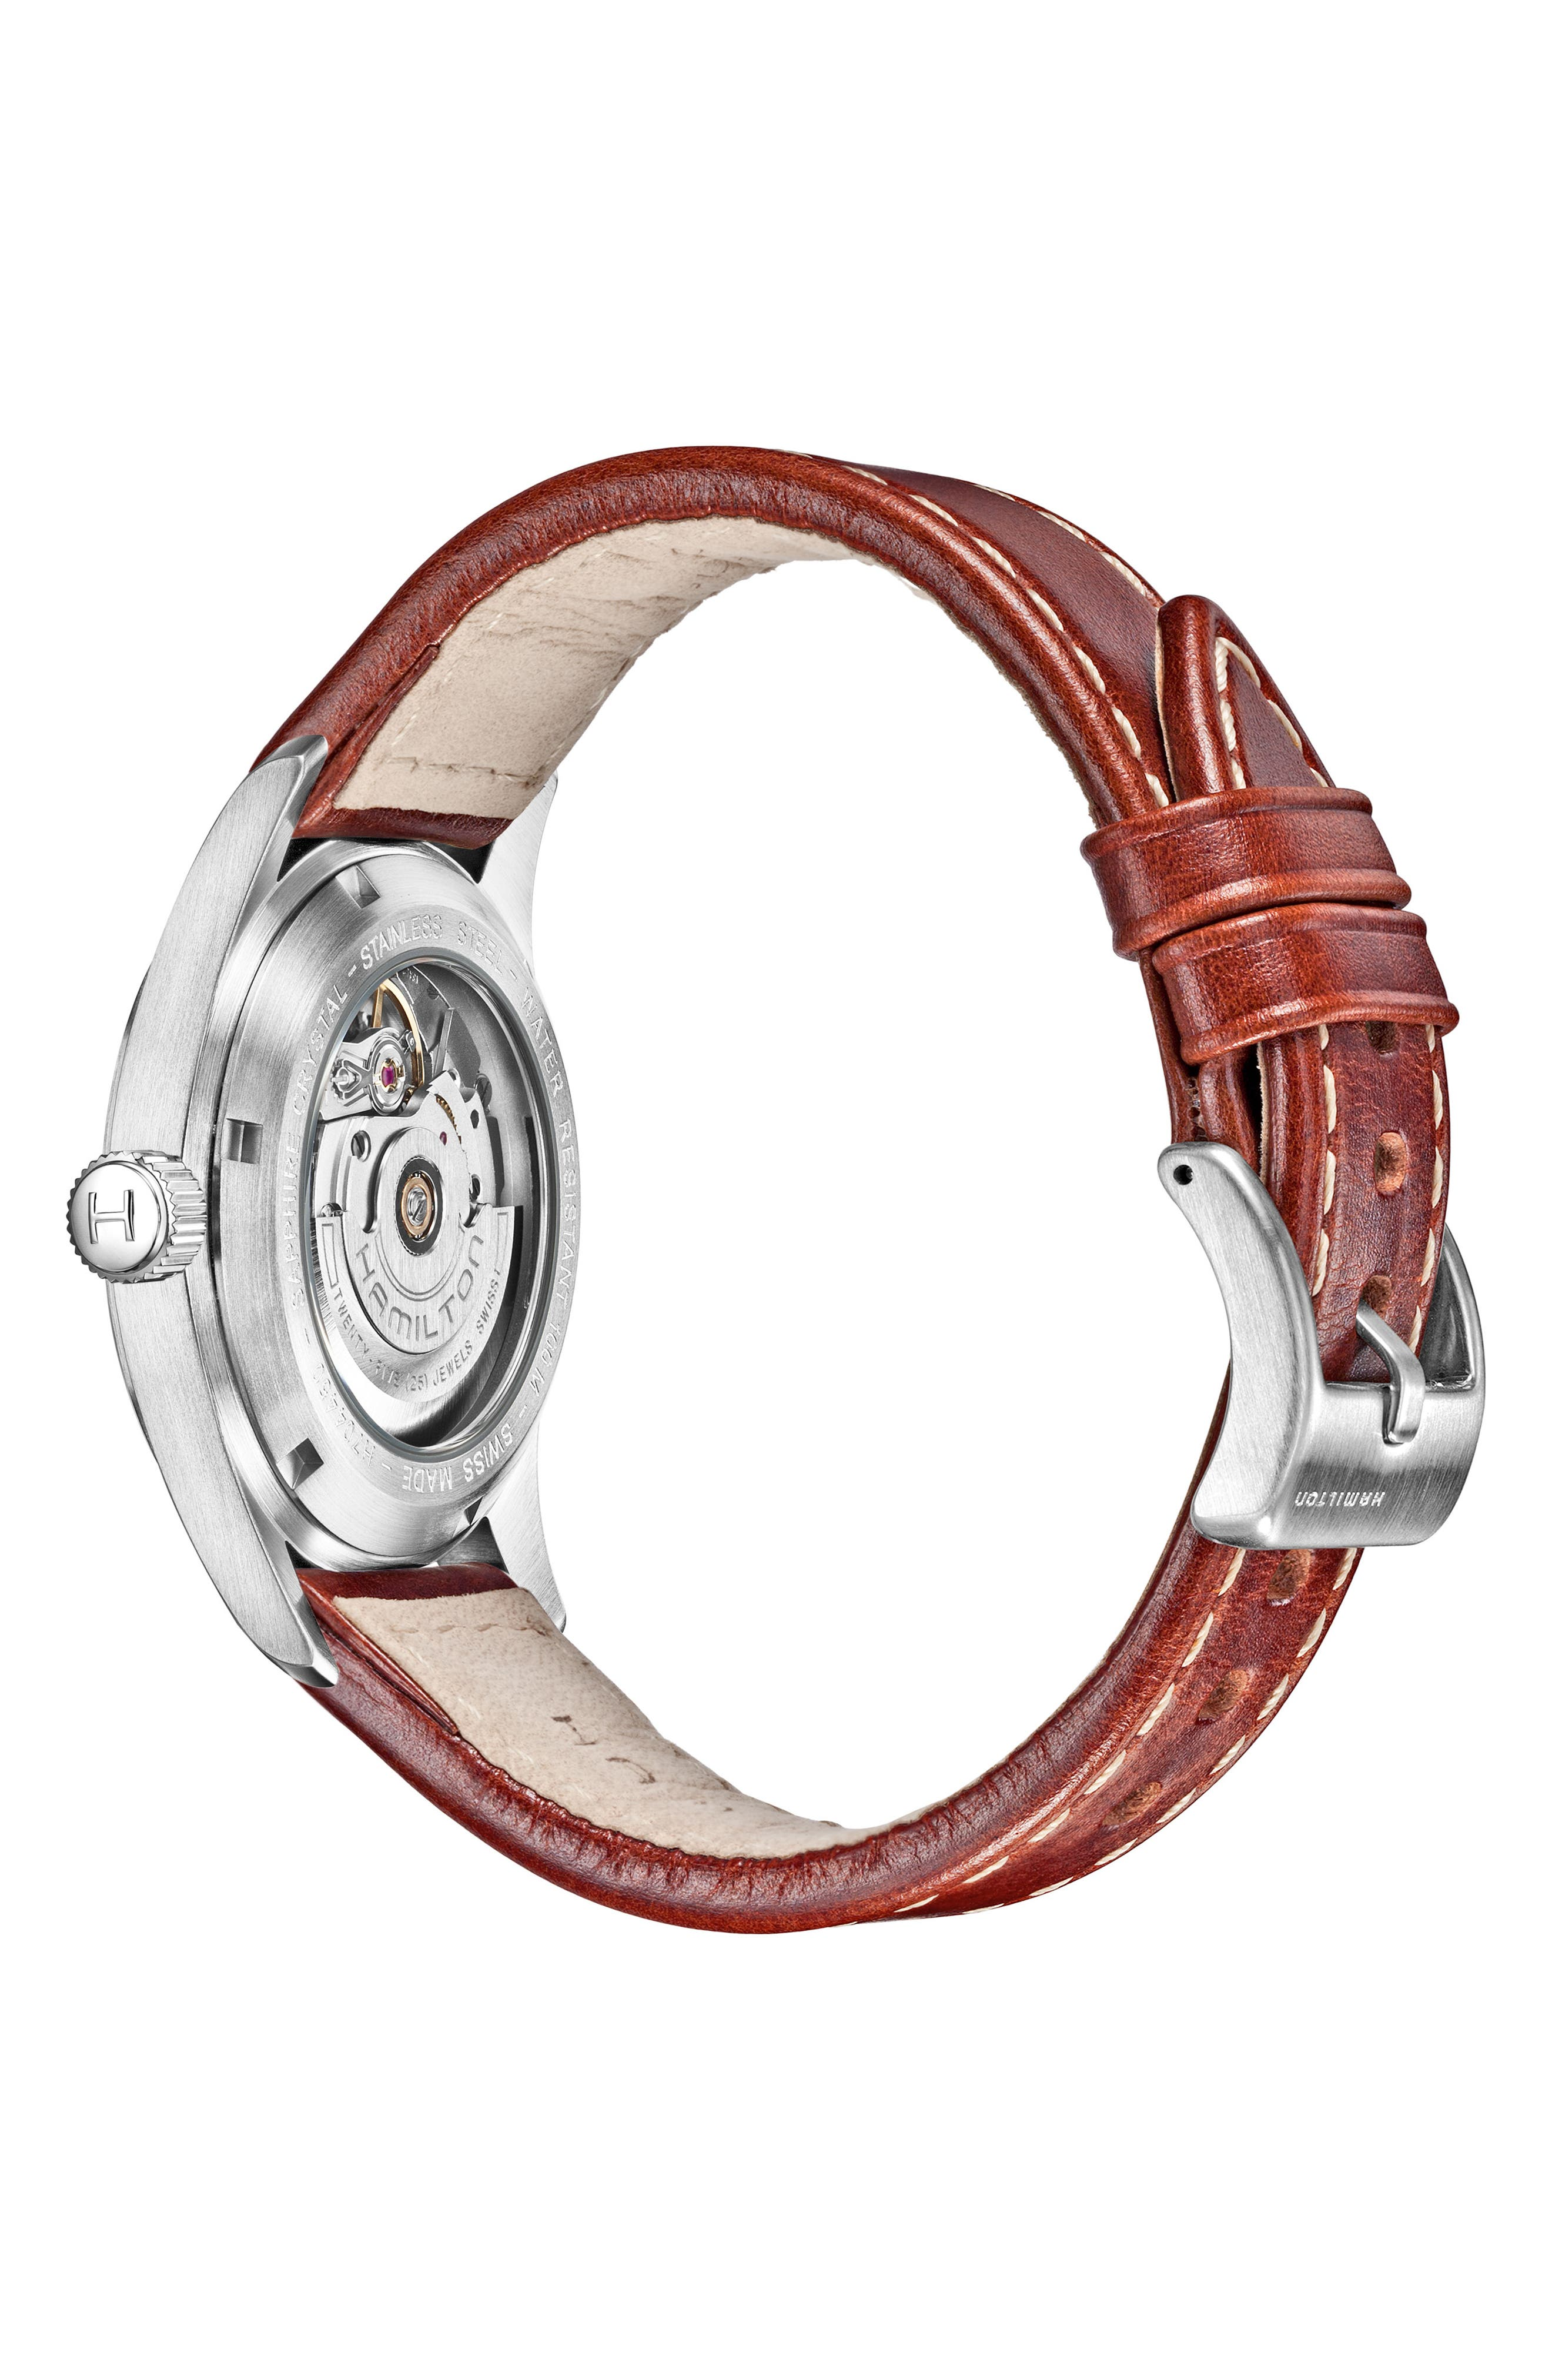 HAMILTON, Khaki Field Automatic Leather Strap Watch, 38mm, Alternate thumbnail 2, color, BROWN/ BLACK/ SILVER